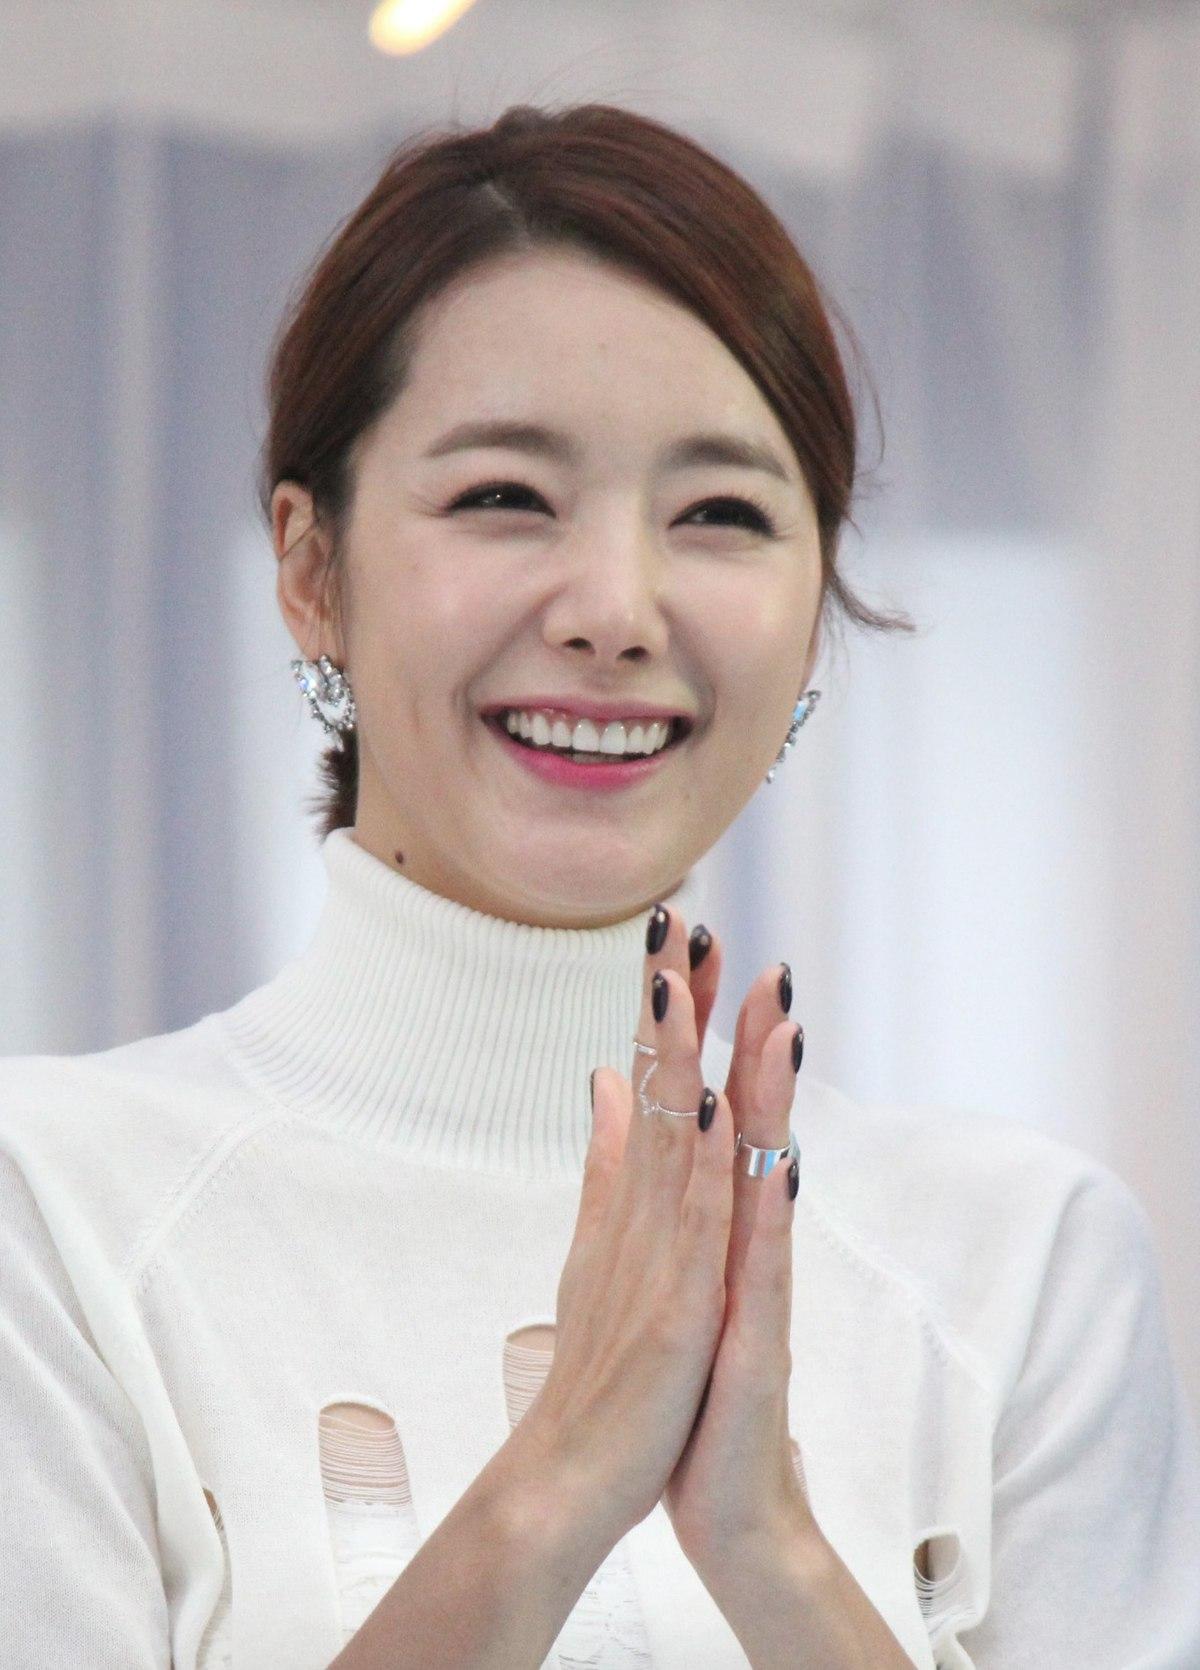 Hyun jin park 2 - 3 4